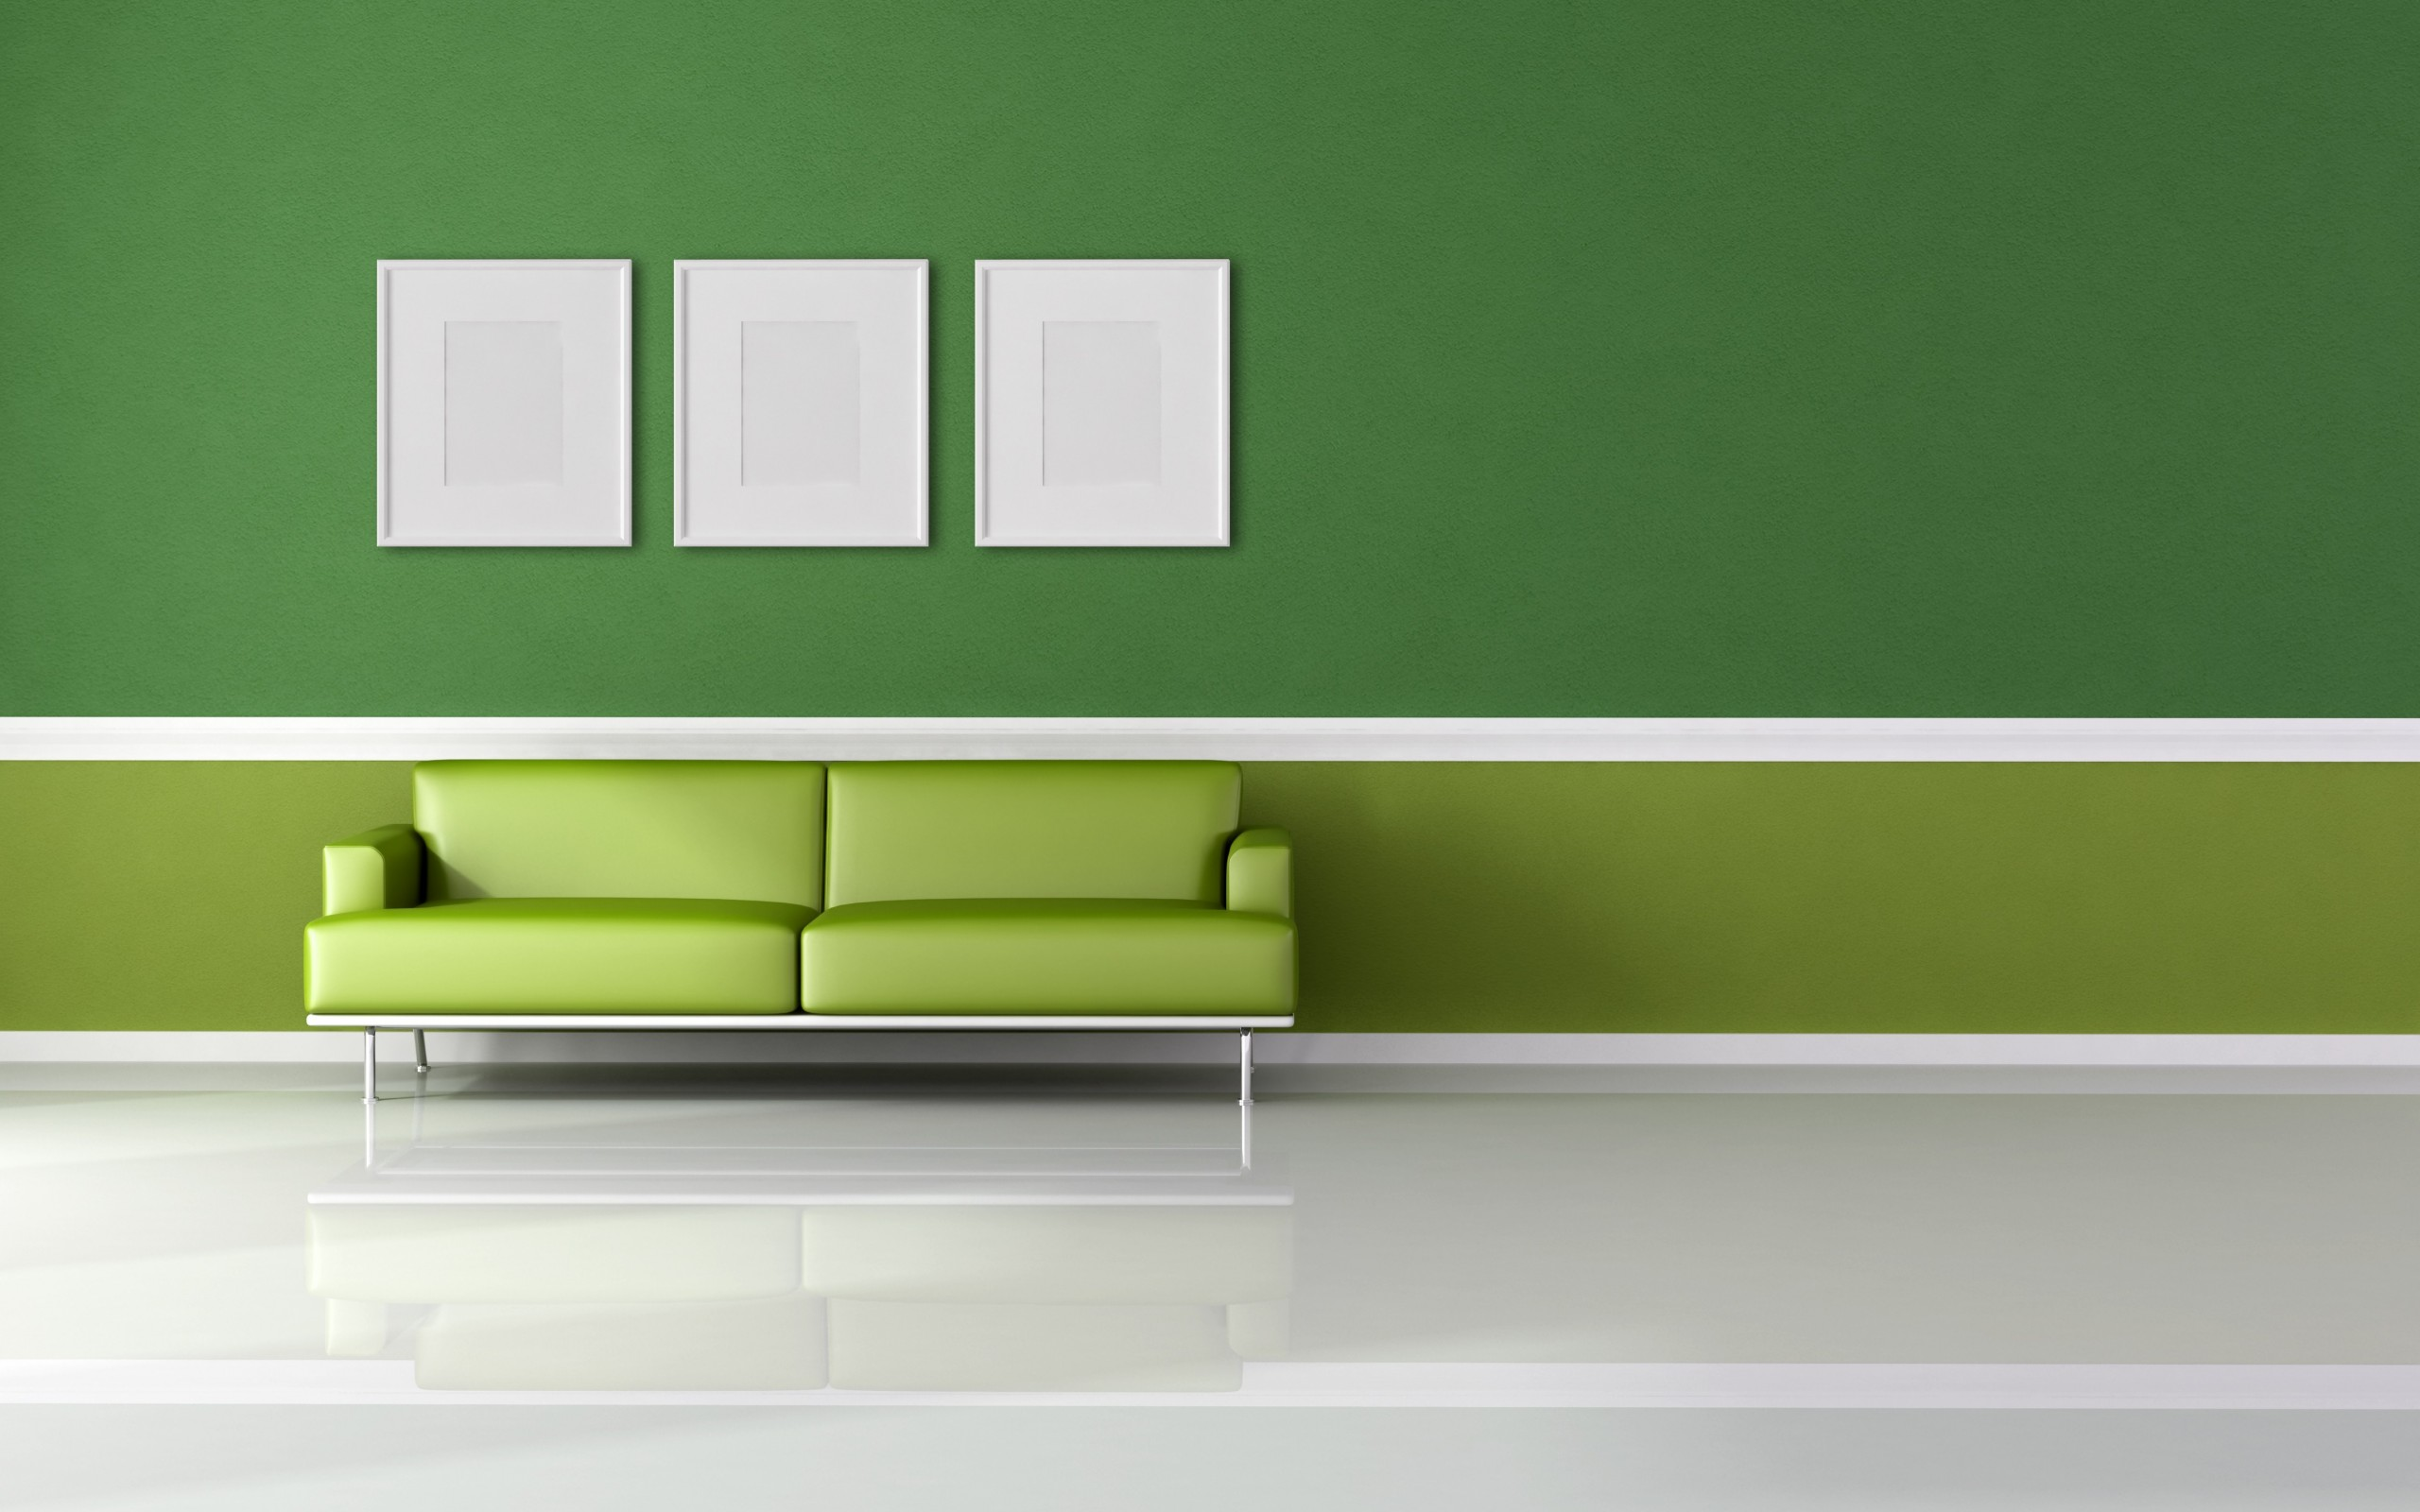 Green Sofa Wallpaper Background 49068 2560x1600px